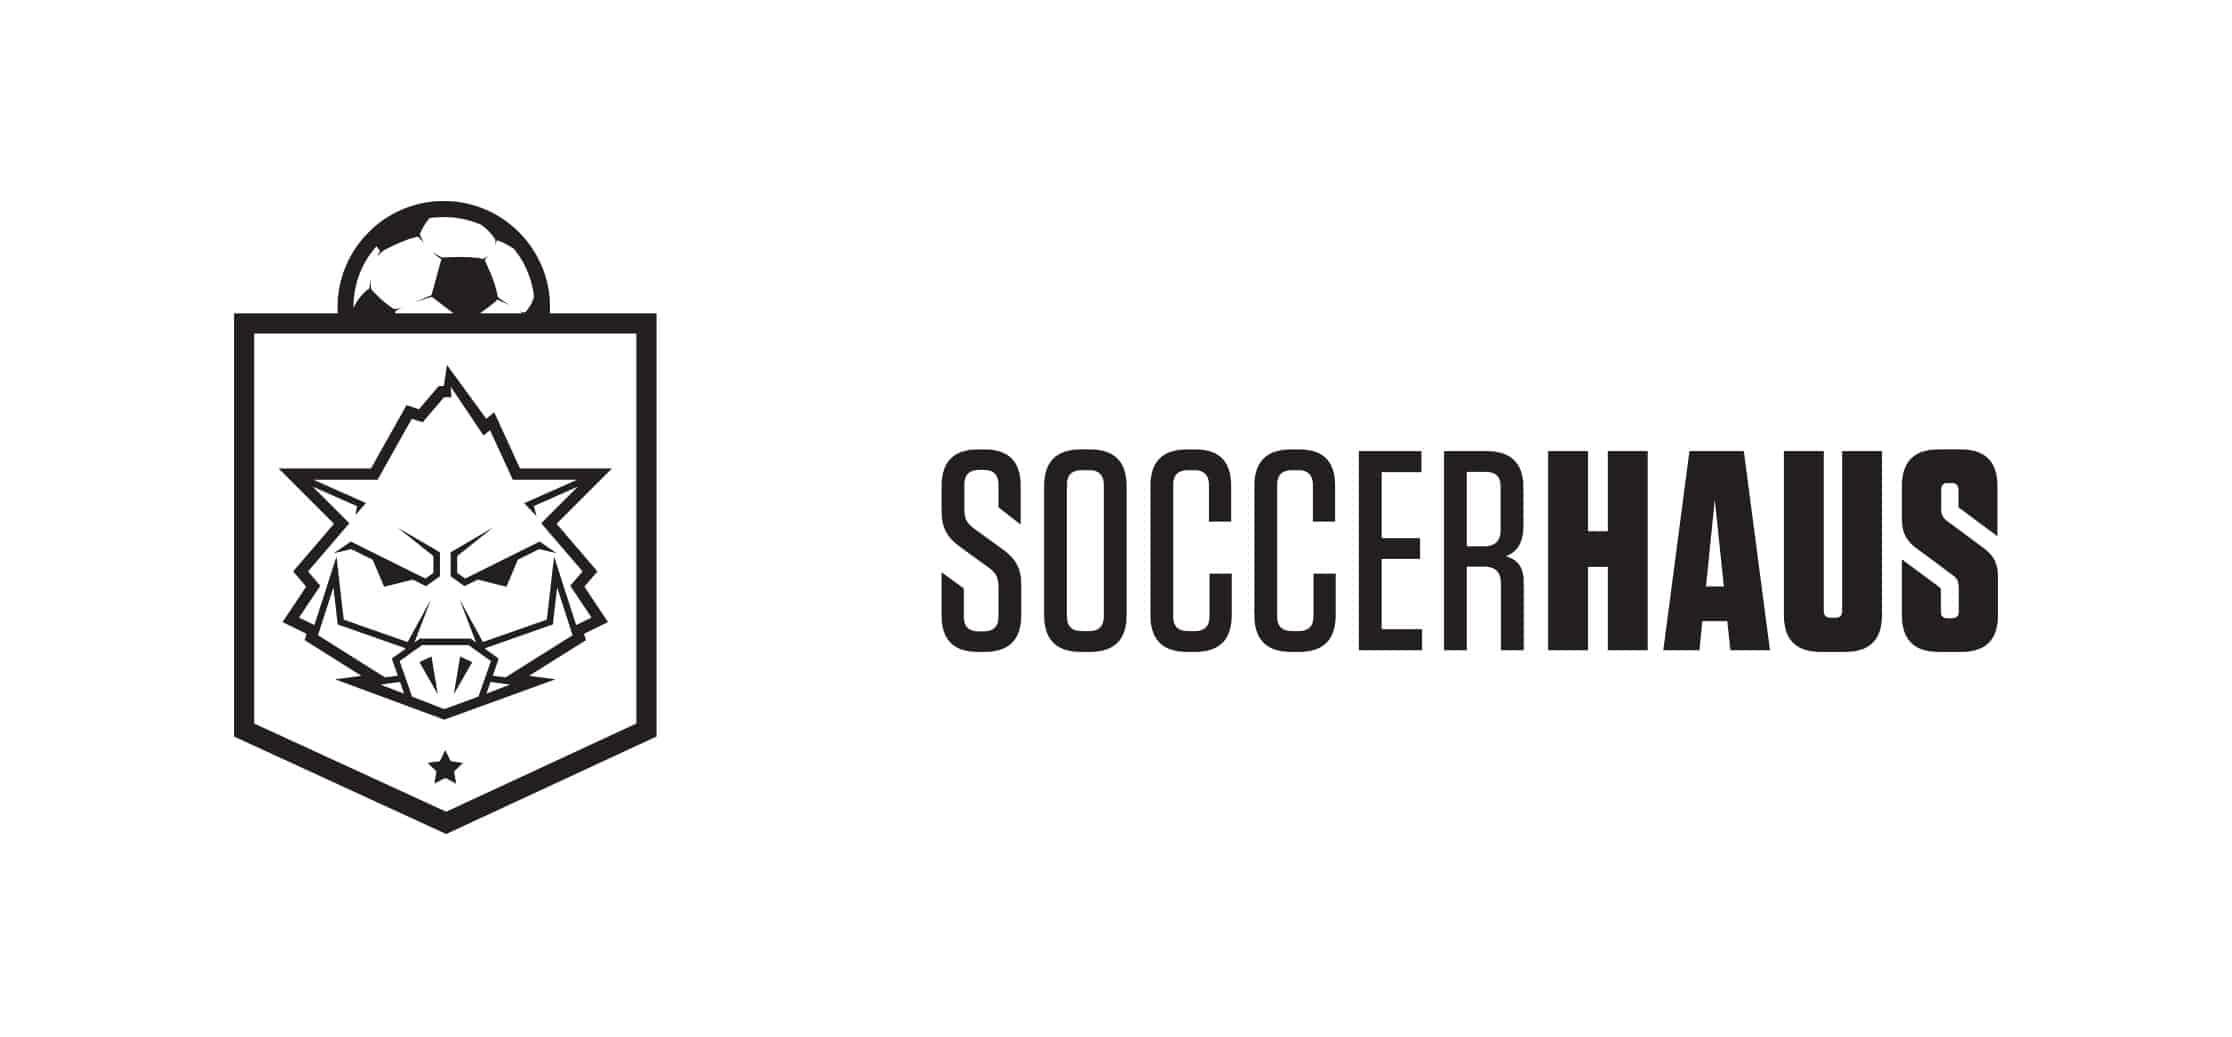 SoccerHaus | Mekanic